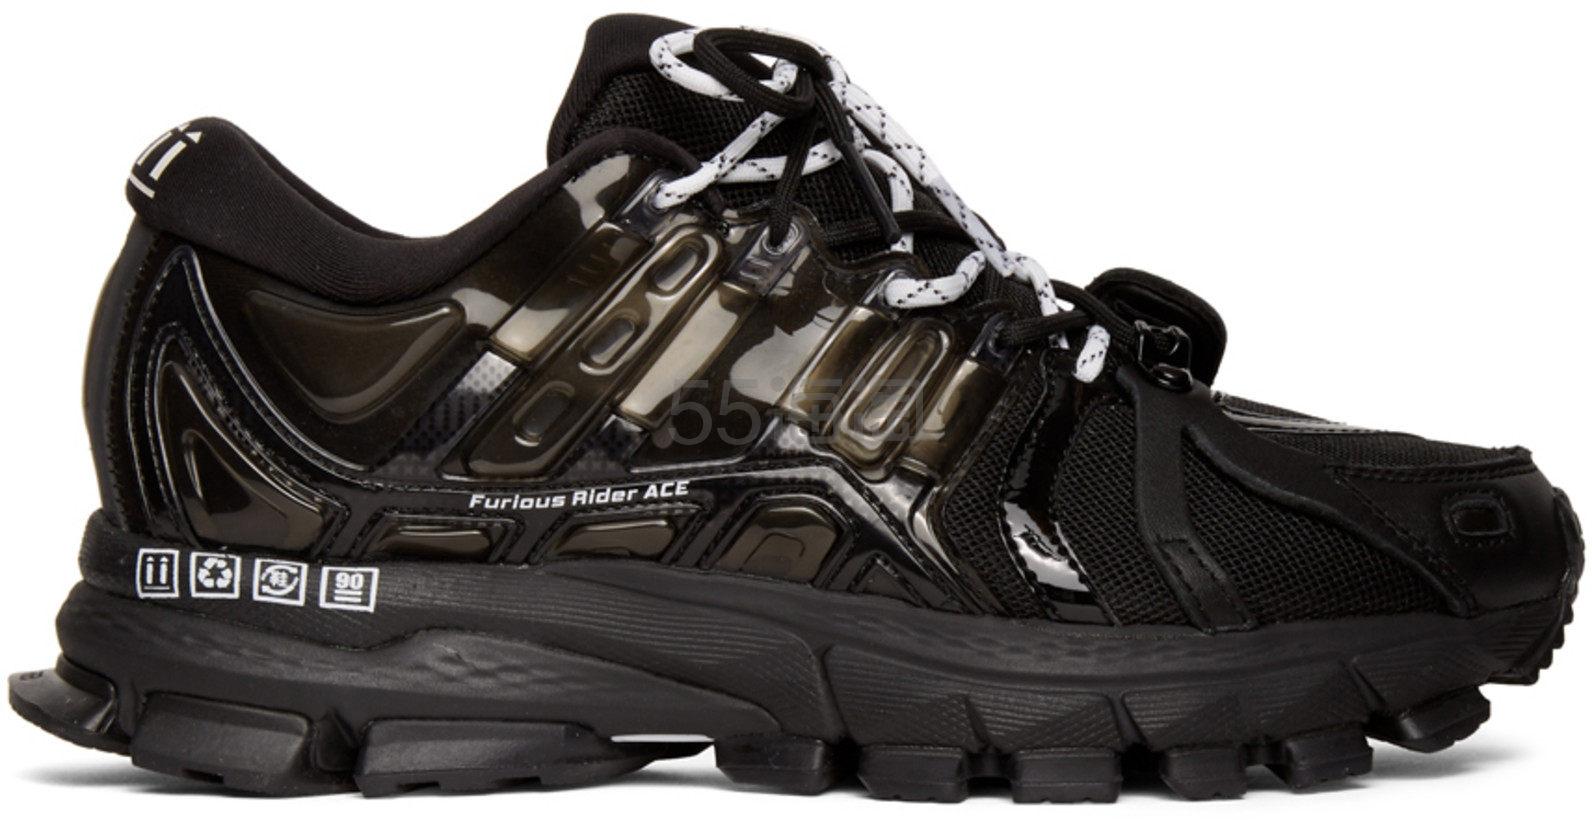 Li-Ning 李宁 Black Furious Rider Ace 1.5 Sneakers 男士运动跑鞋 纯黑走秀款 0(约1,266元) - 海淘优惠海淘折扣|55海淘网